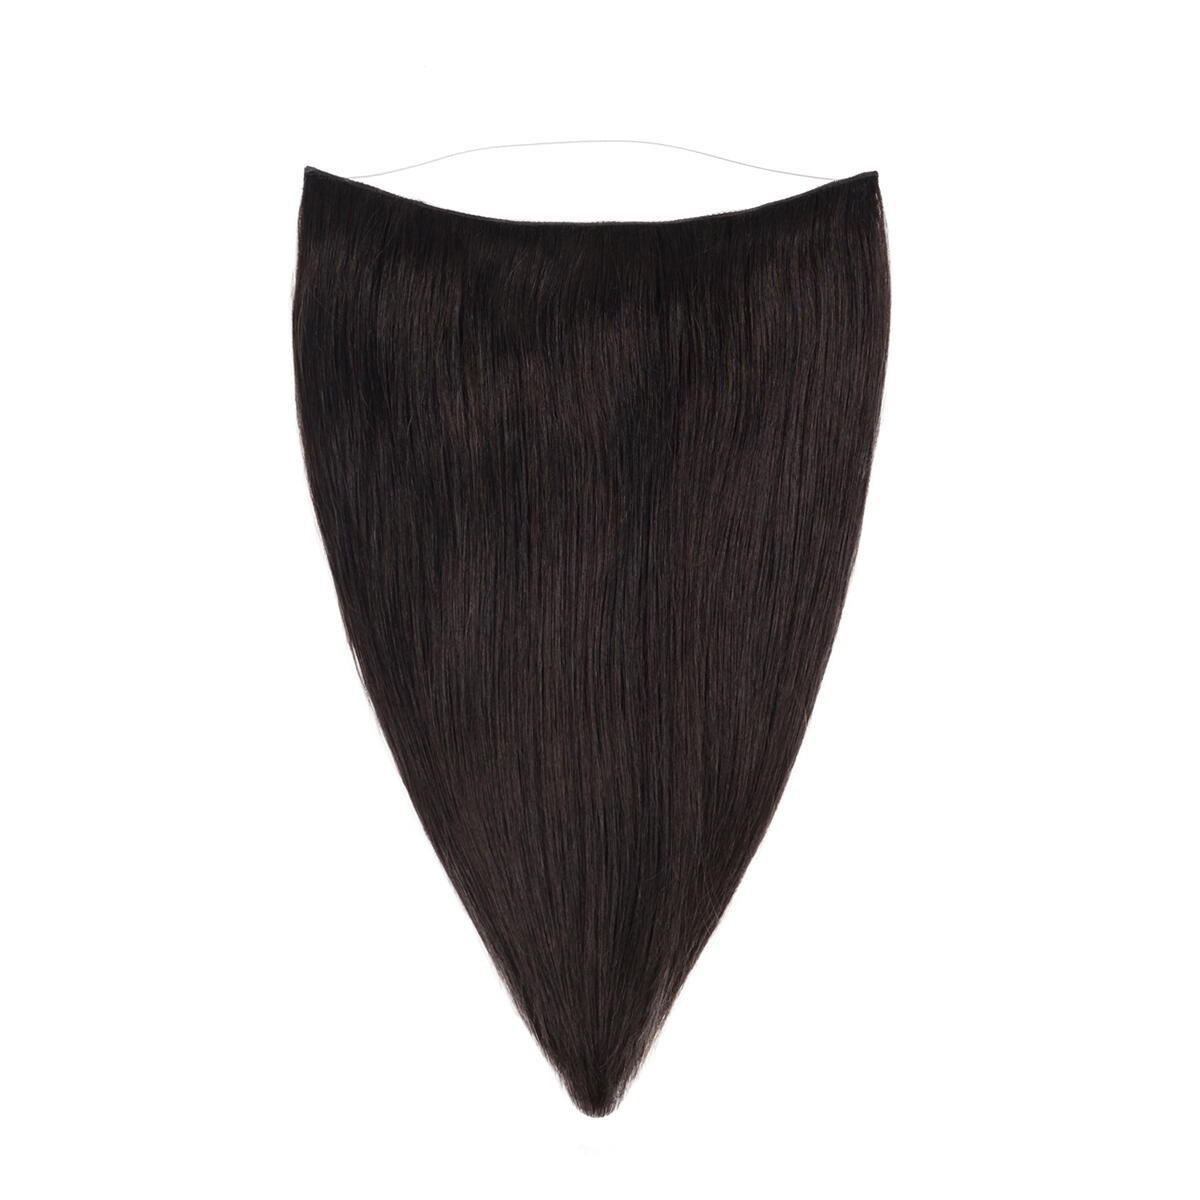 Hairband Original 1.2 Black Brown 45 cm